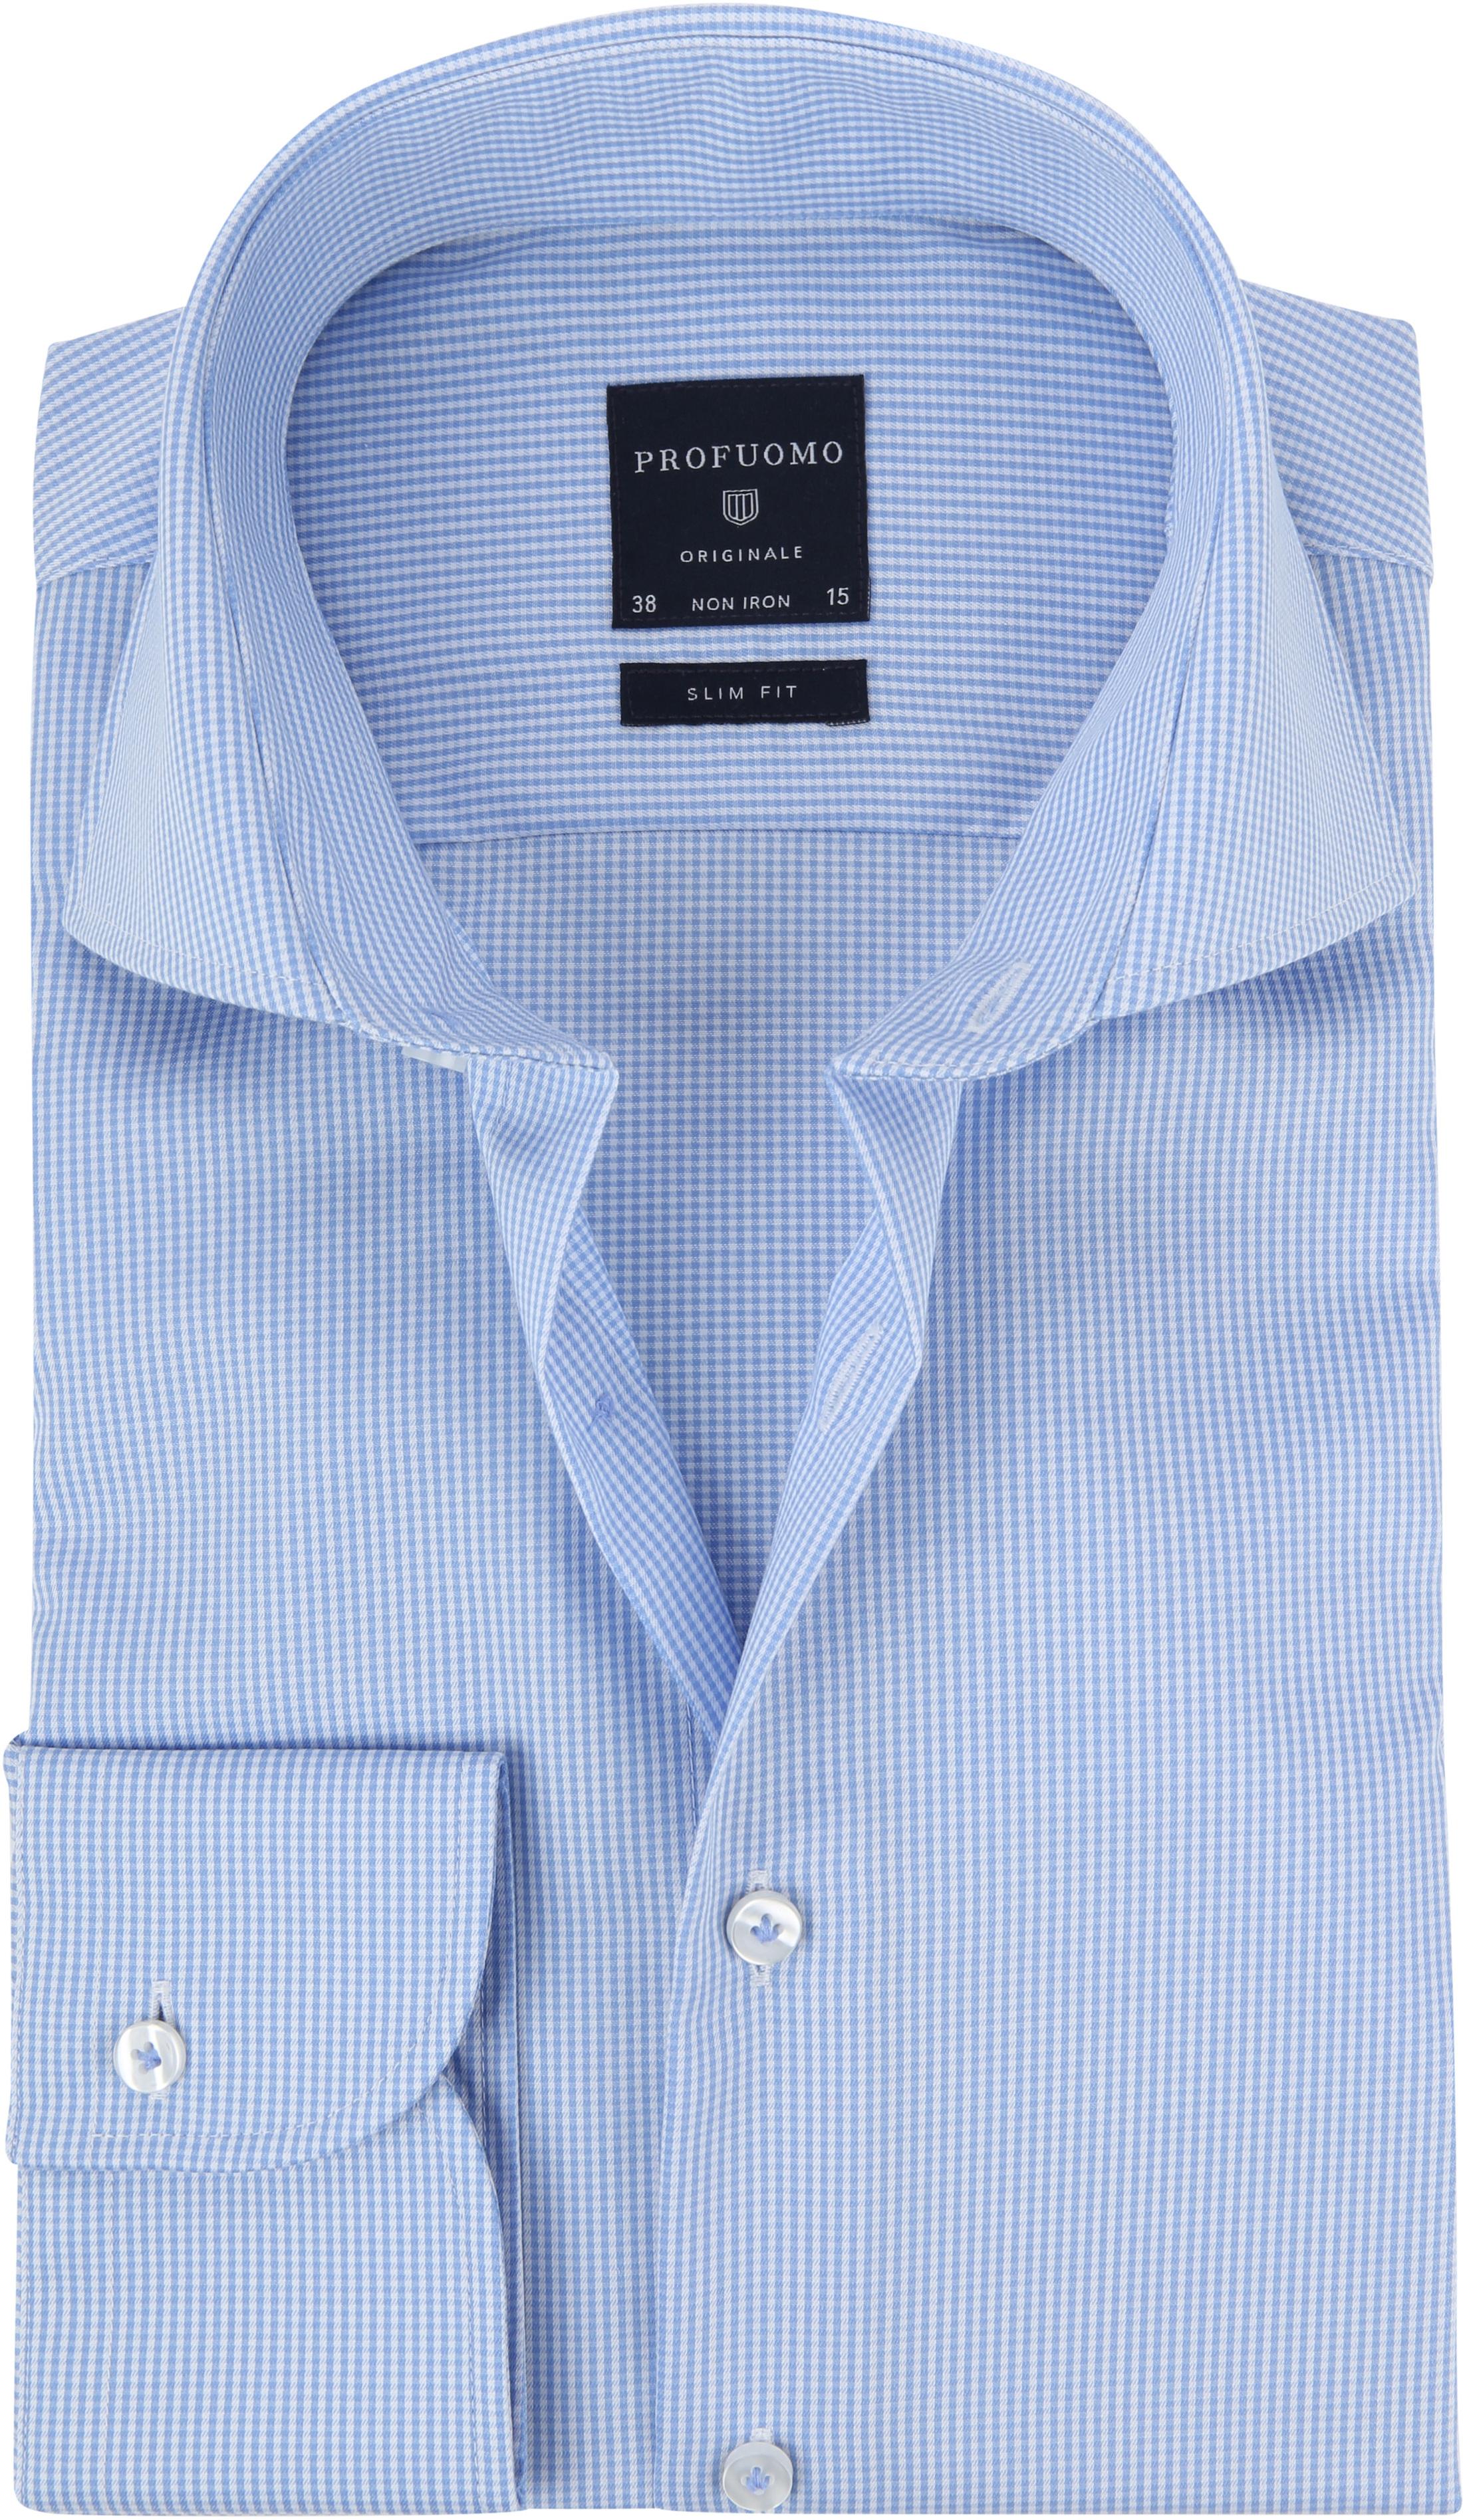 Profuomo Overhemd Cutaway Blauw Ruit foto 0